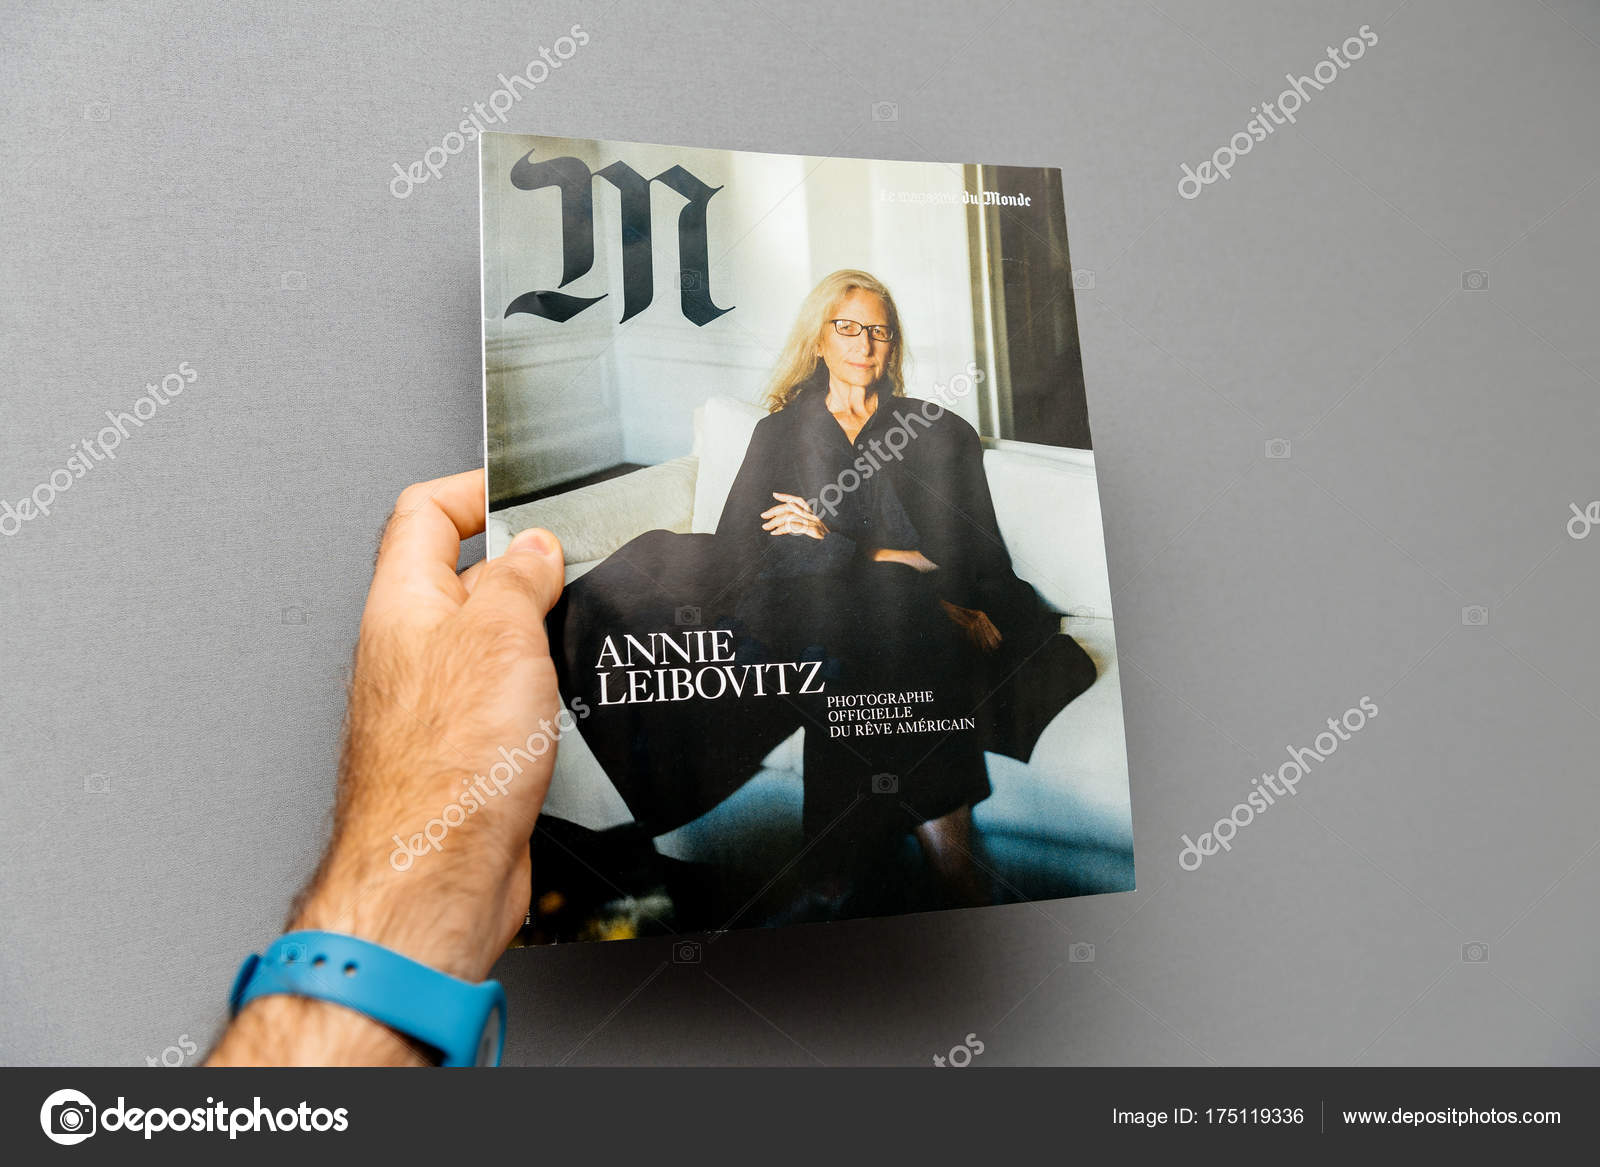 Man holding M Magazine le monde with Anne Leibovitz – Stock